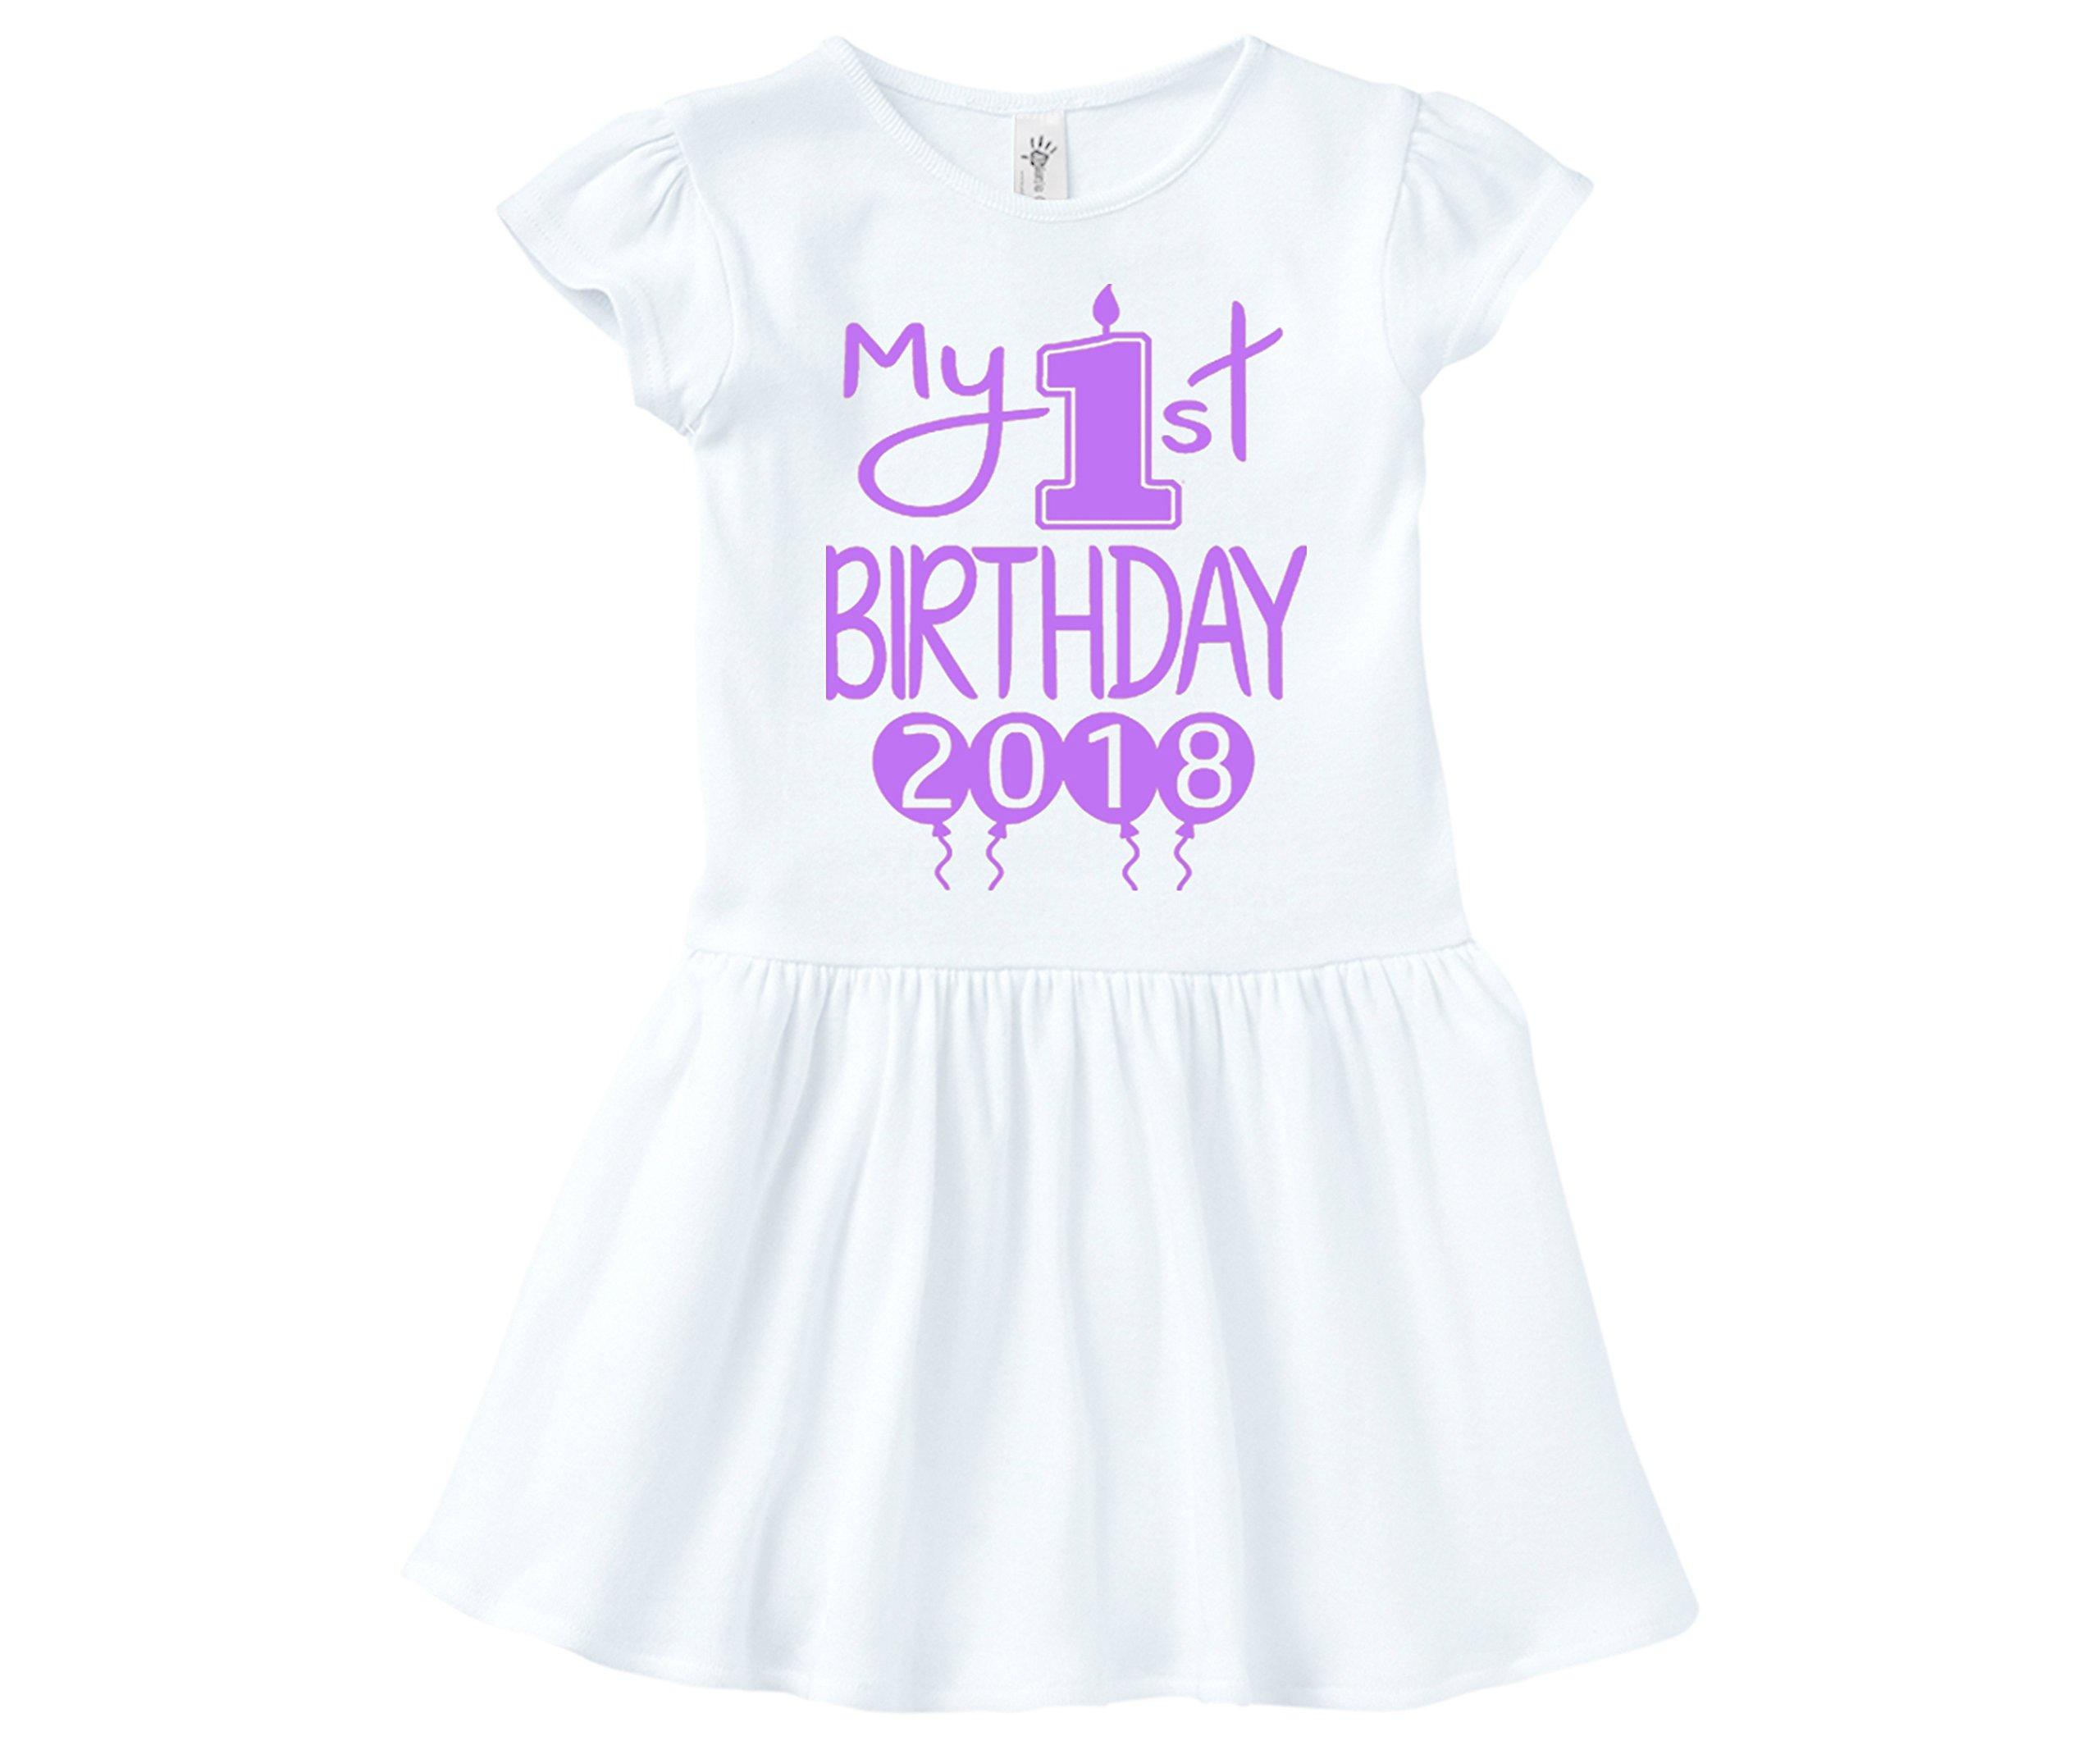 Aiden's Corner Baby Girl First Birthday Dress - My First Birthday 2018 Dress (12 Months, Lilac White)